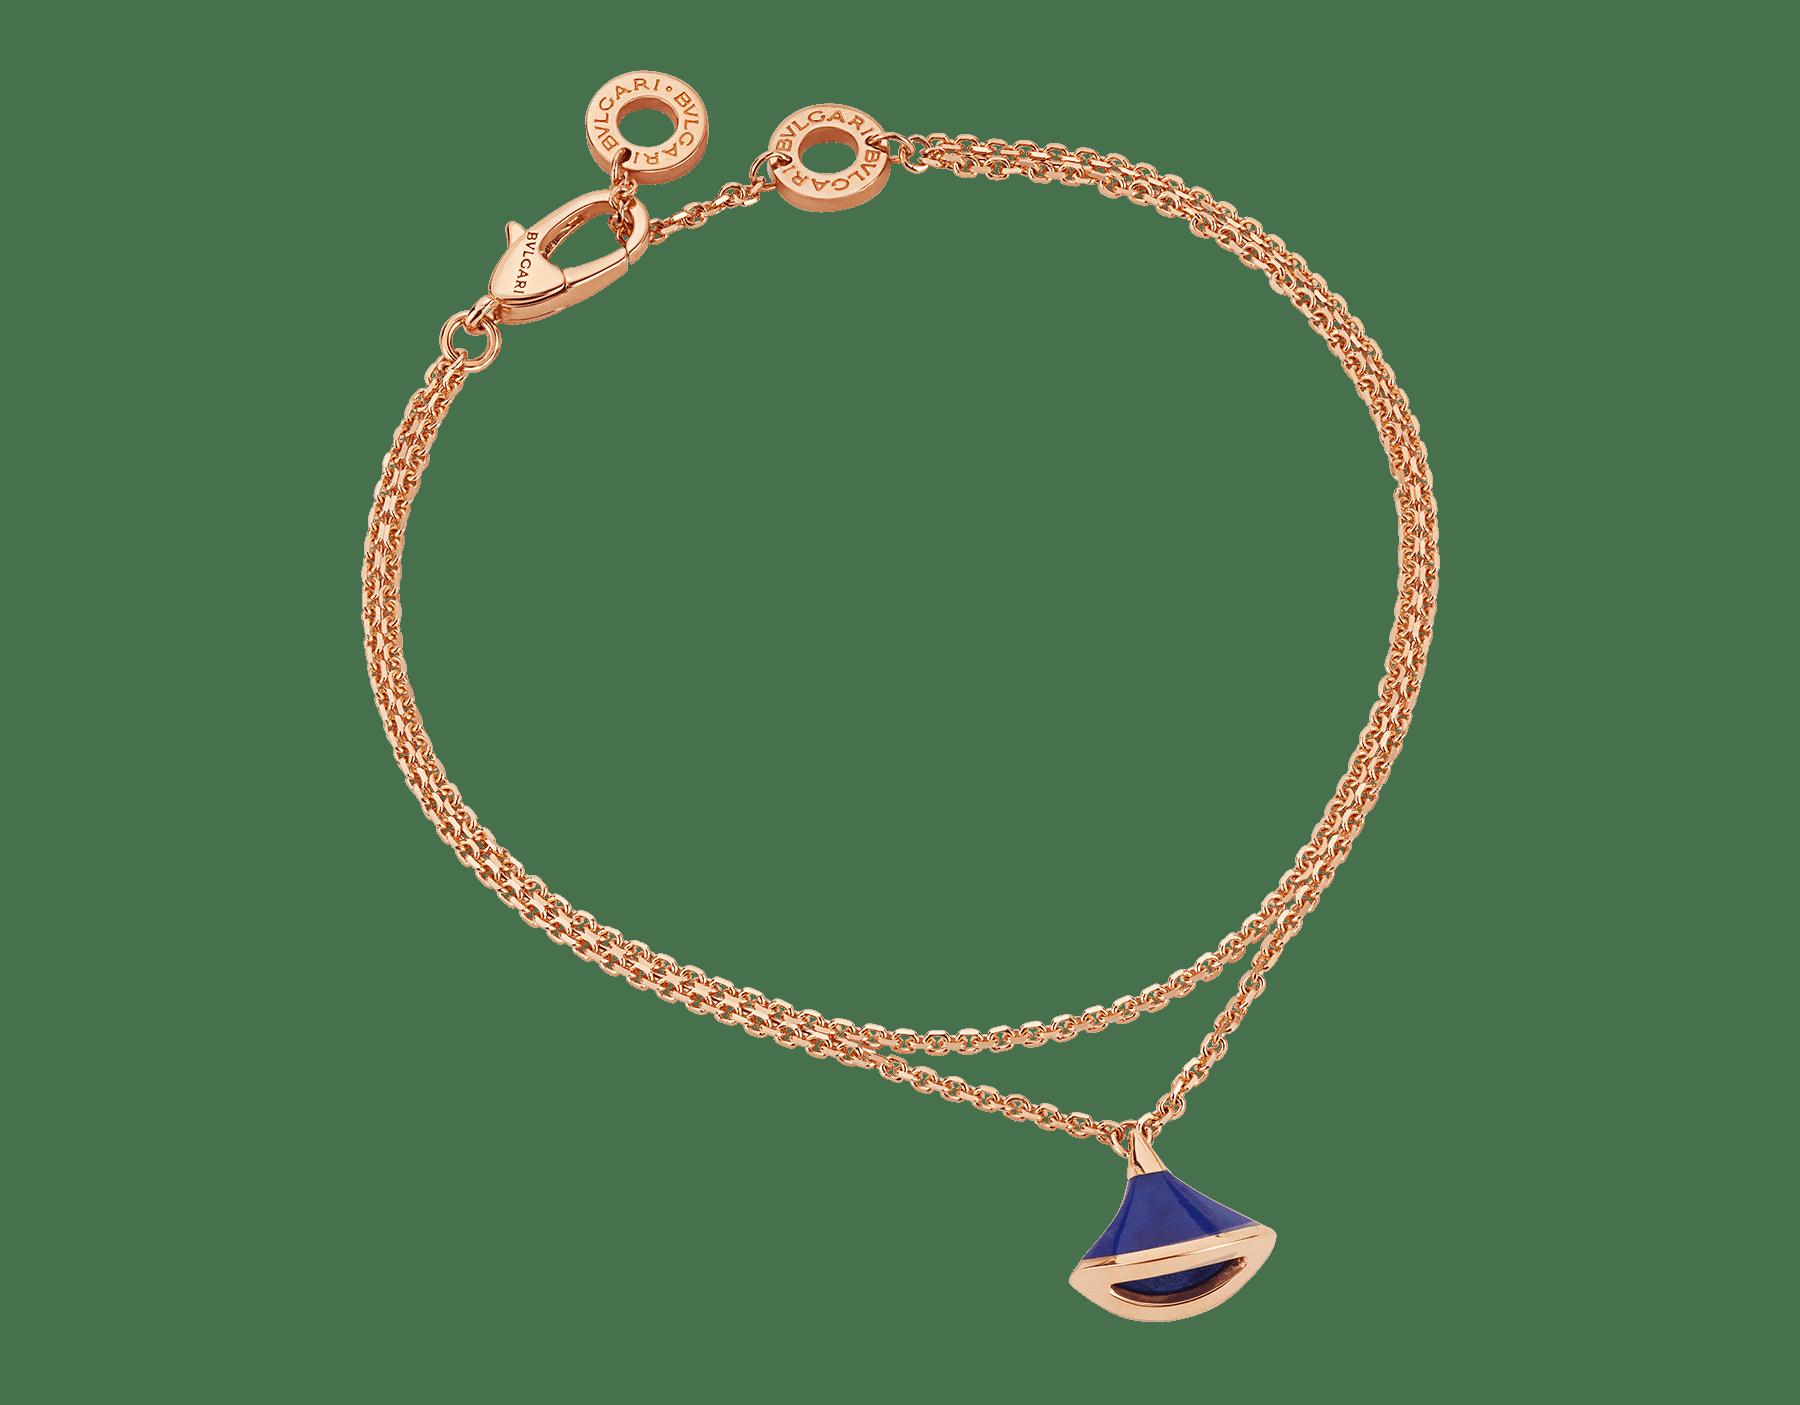 DIVAS' DREAM bracelet in 18 kt rose gold with pendant set with lapis lazuli. BR857290 image 1